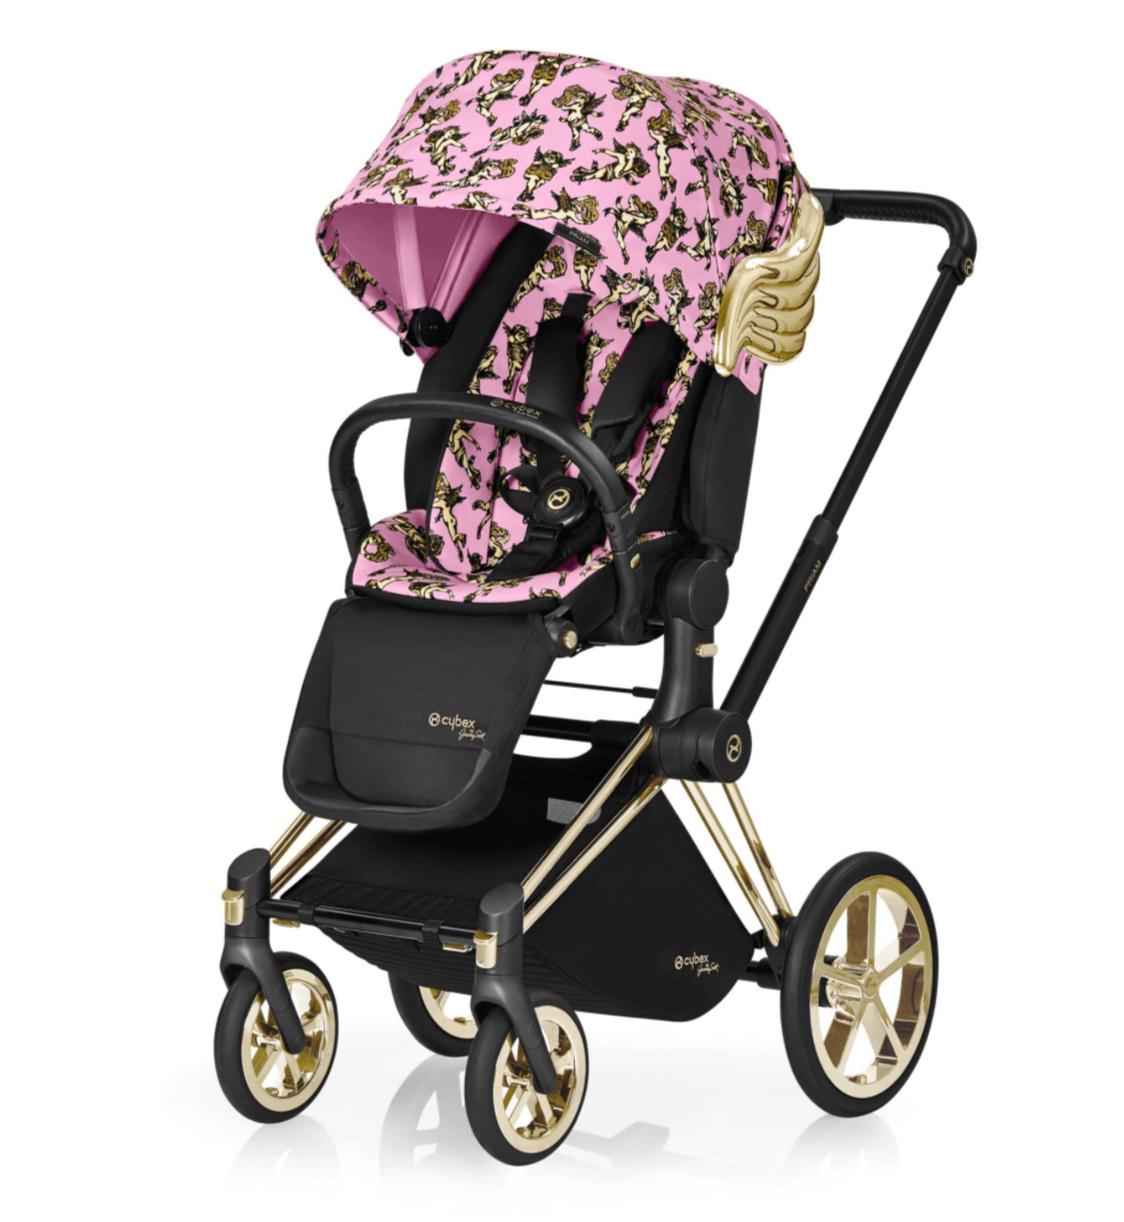 Priam Stroller by Jeremy Scott - Pink